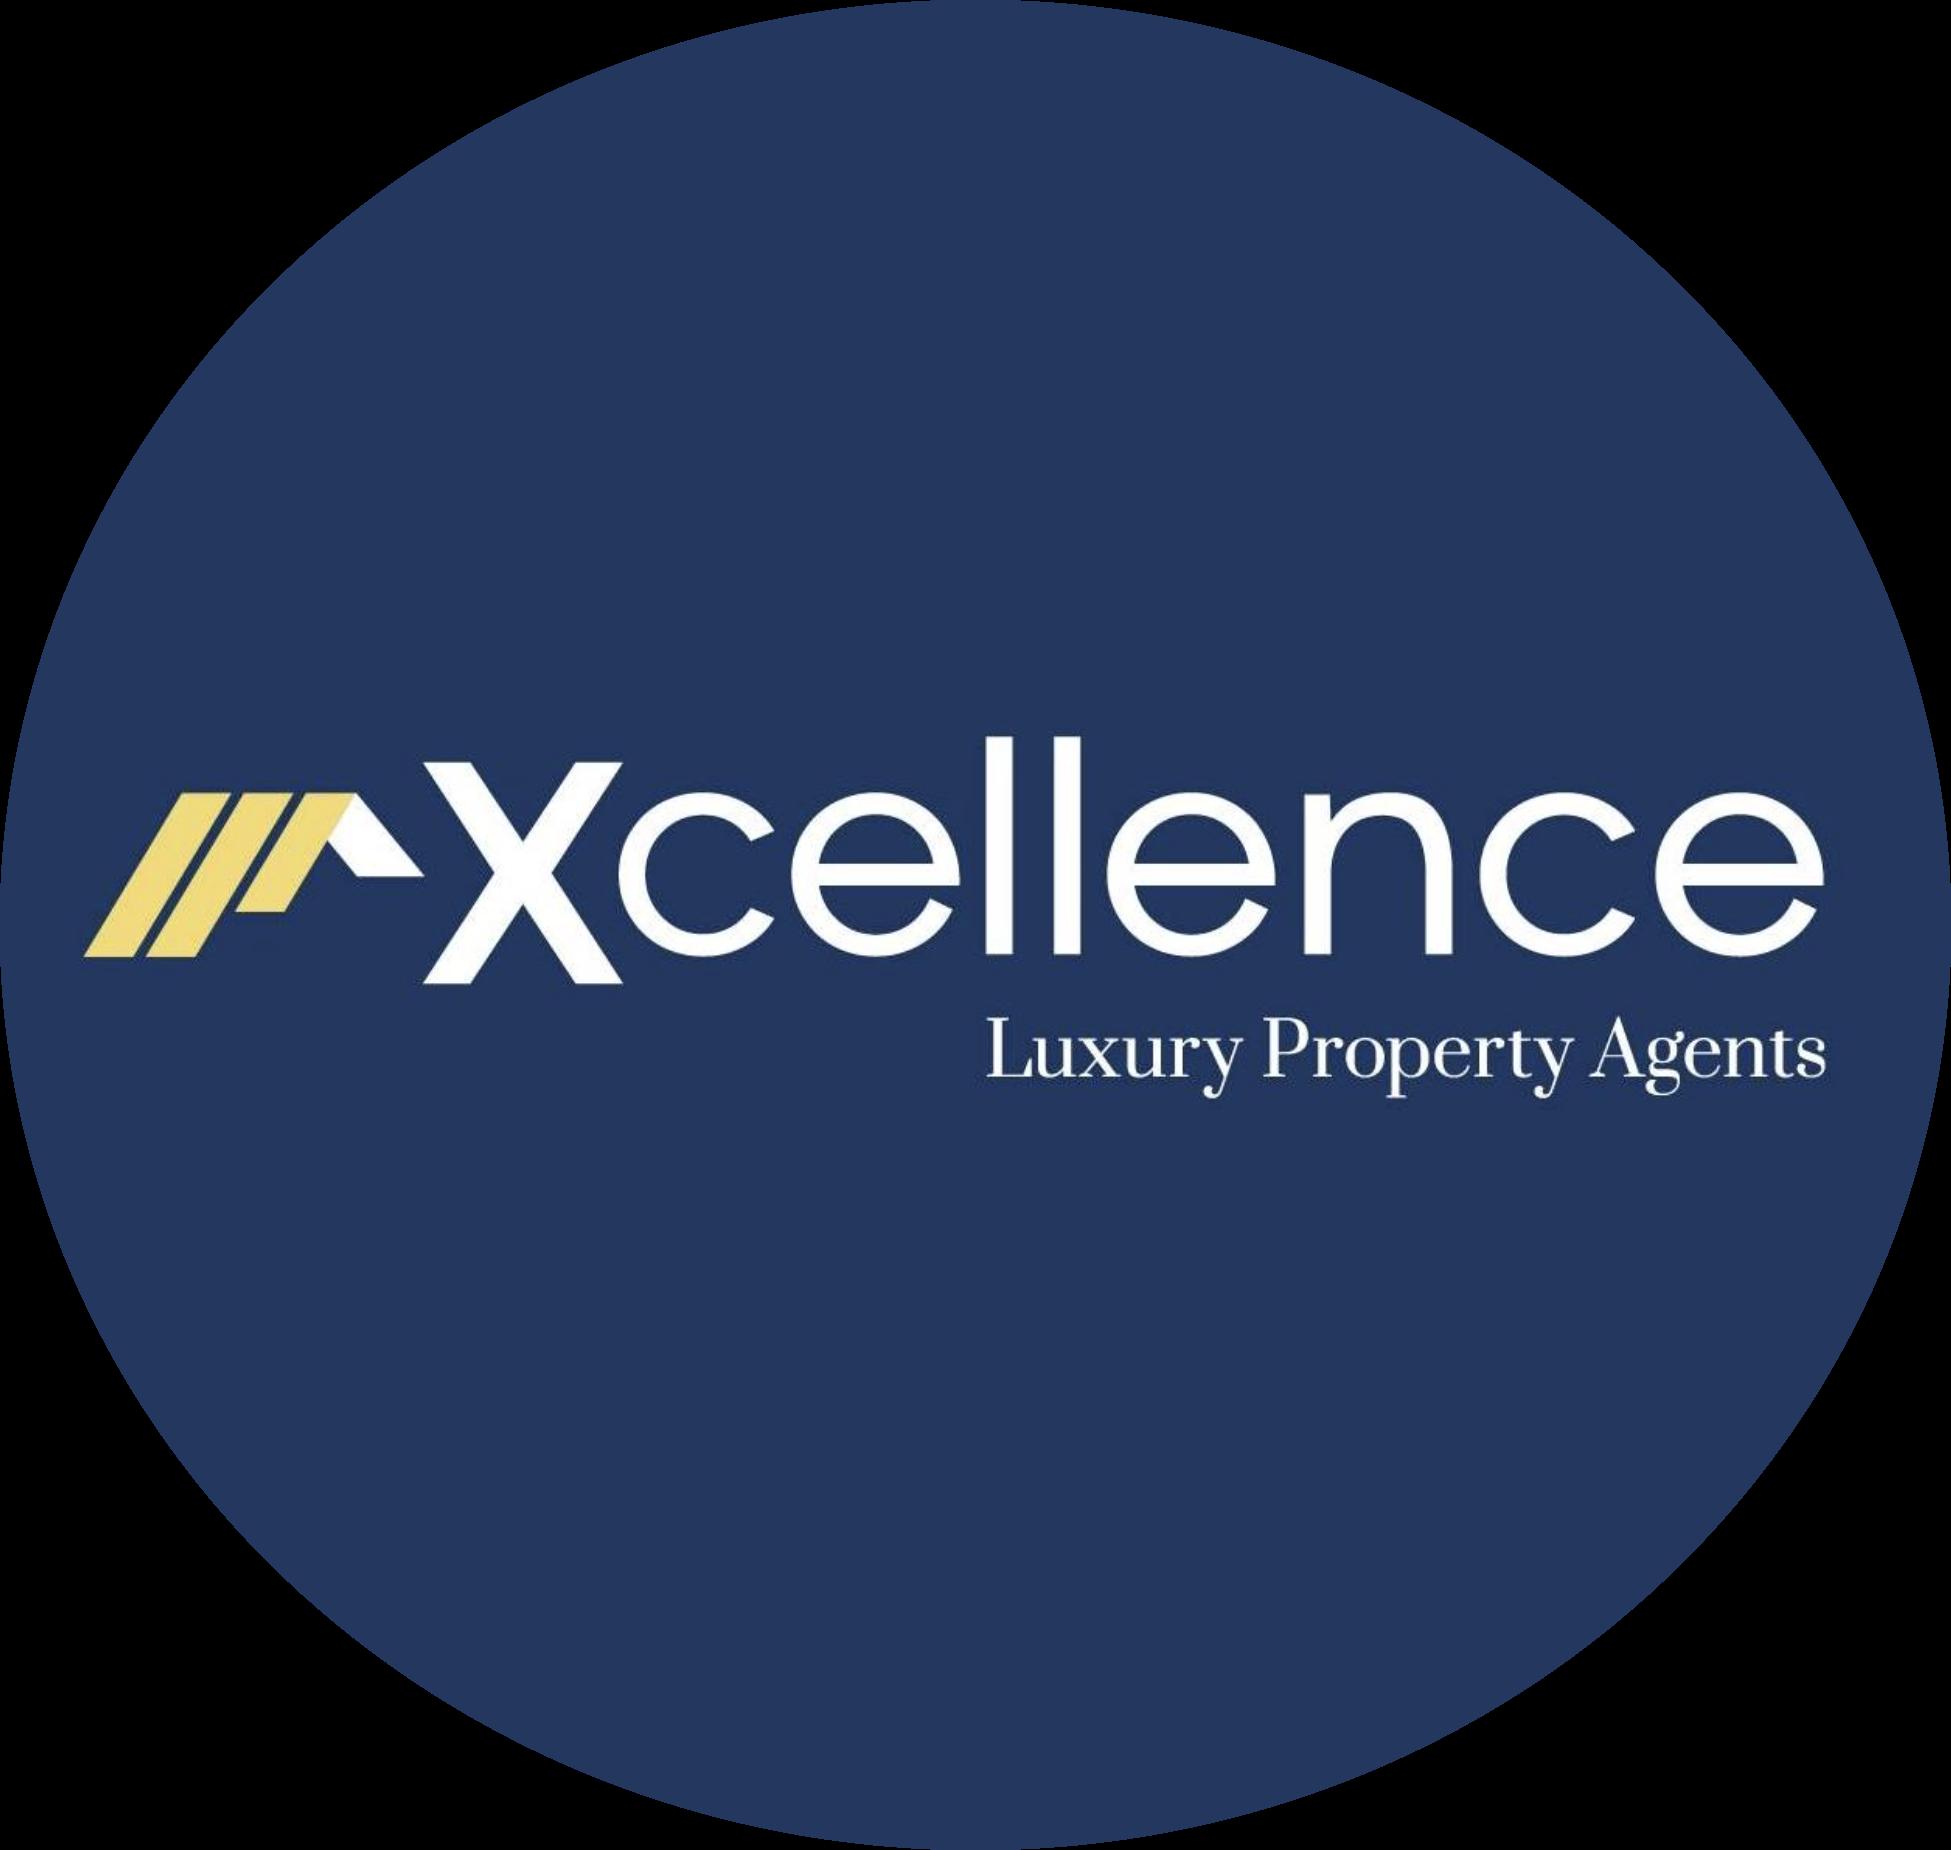 Xcellence Properties